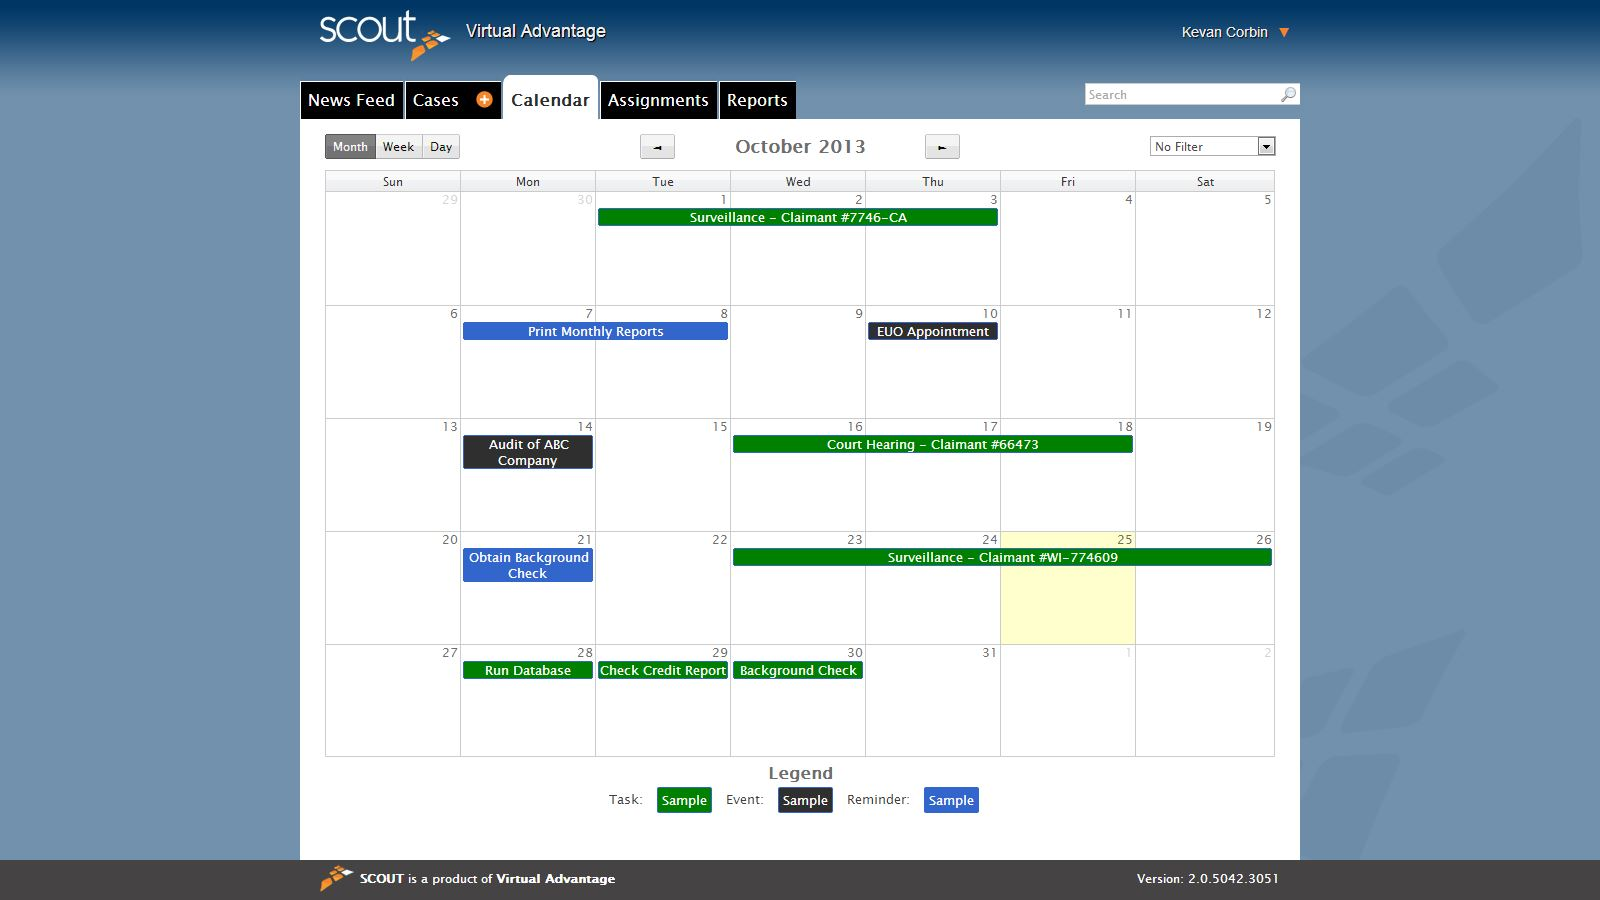 Actions & Calendar Case Management Software